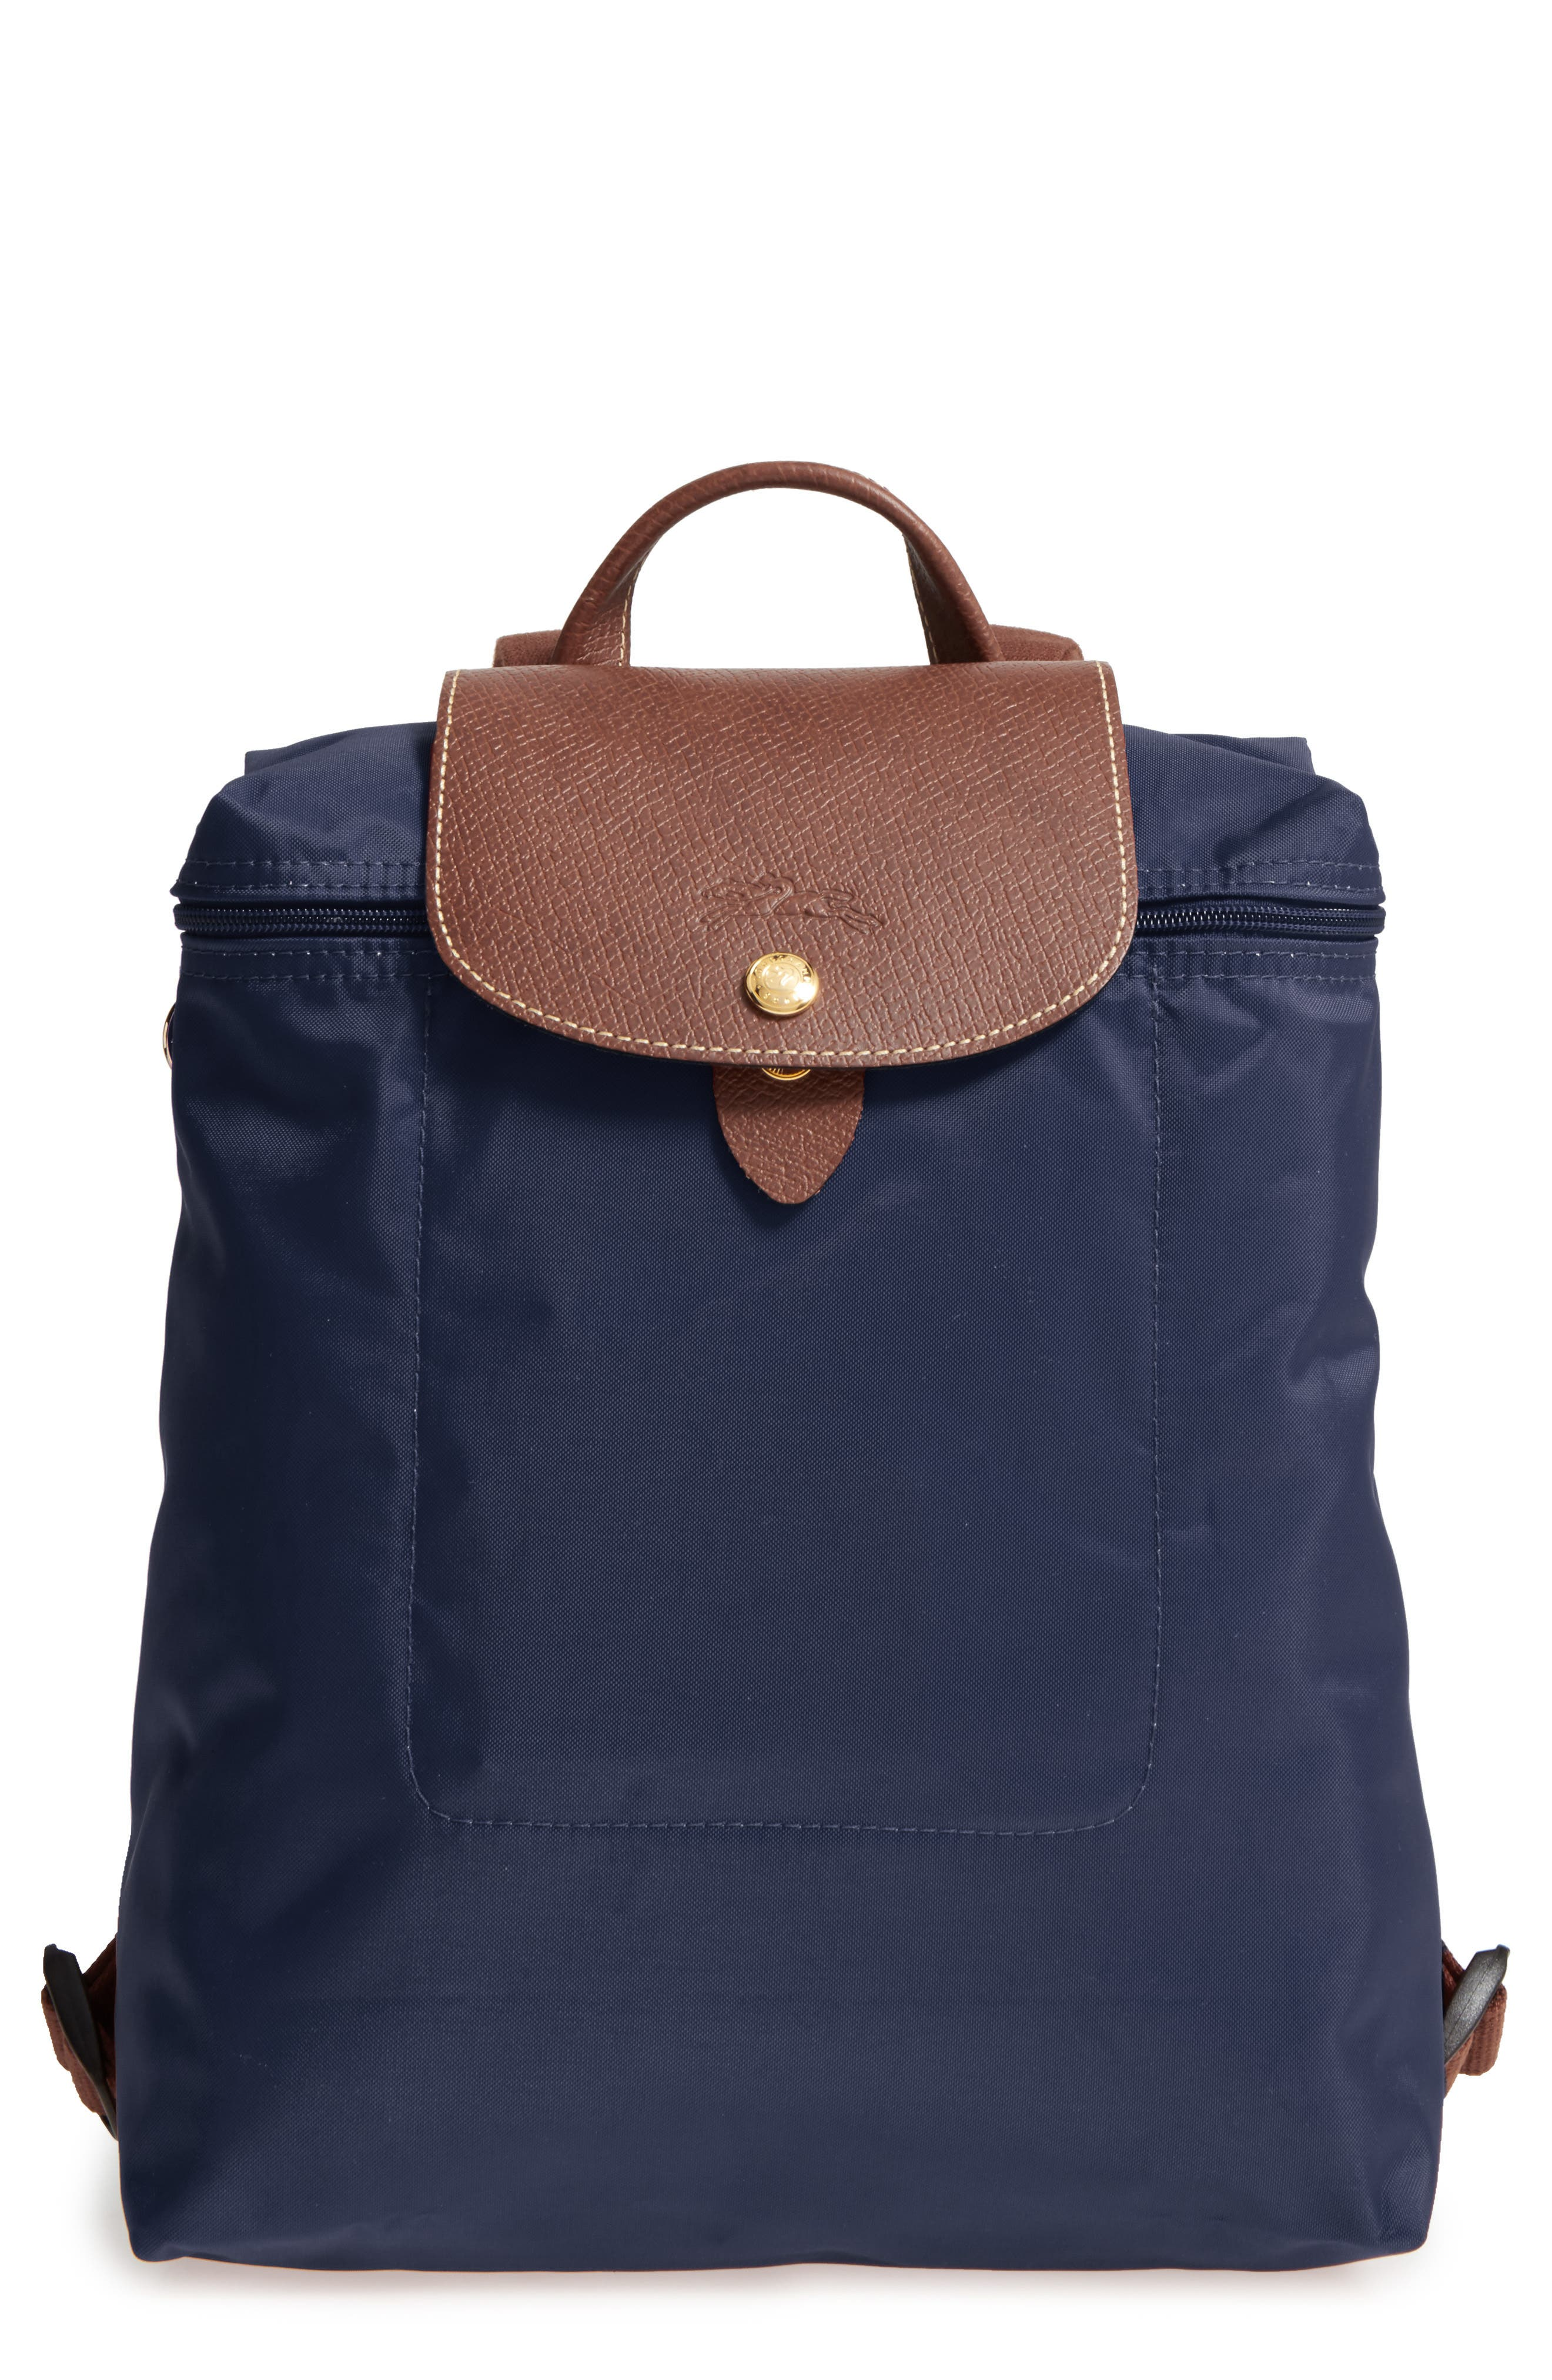 c4c974021ae3 Handbags   Wallets for Women